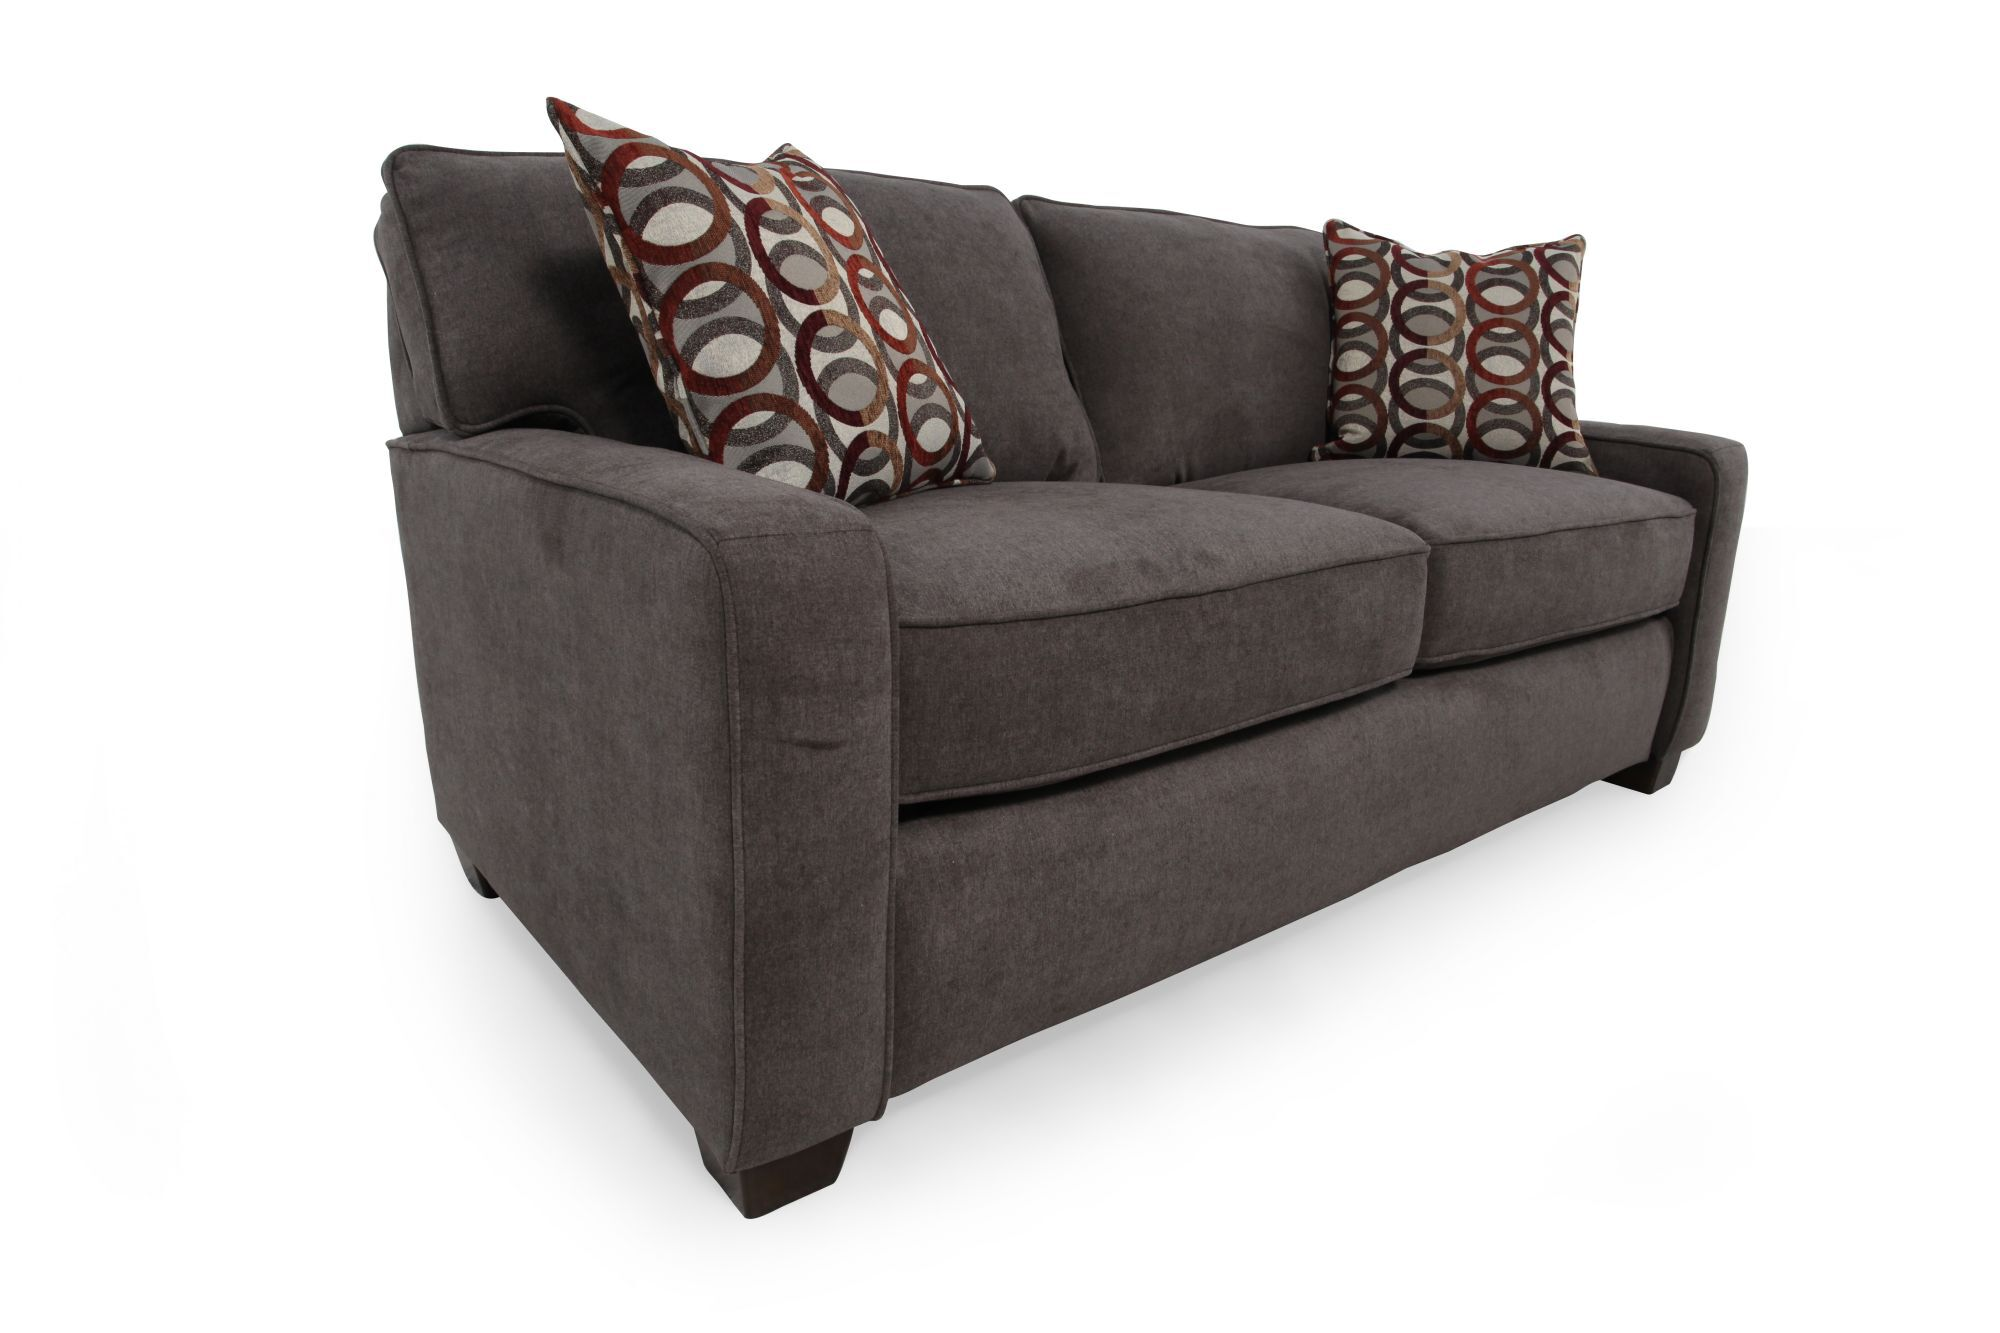 Lane Sleeper Sofa Loveseat Kitchen And Bedroom Interior Design